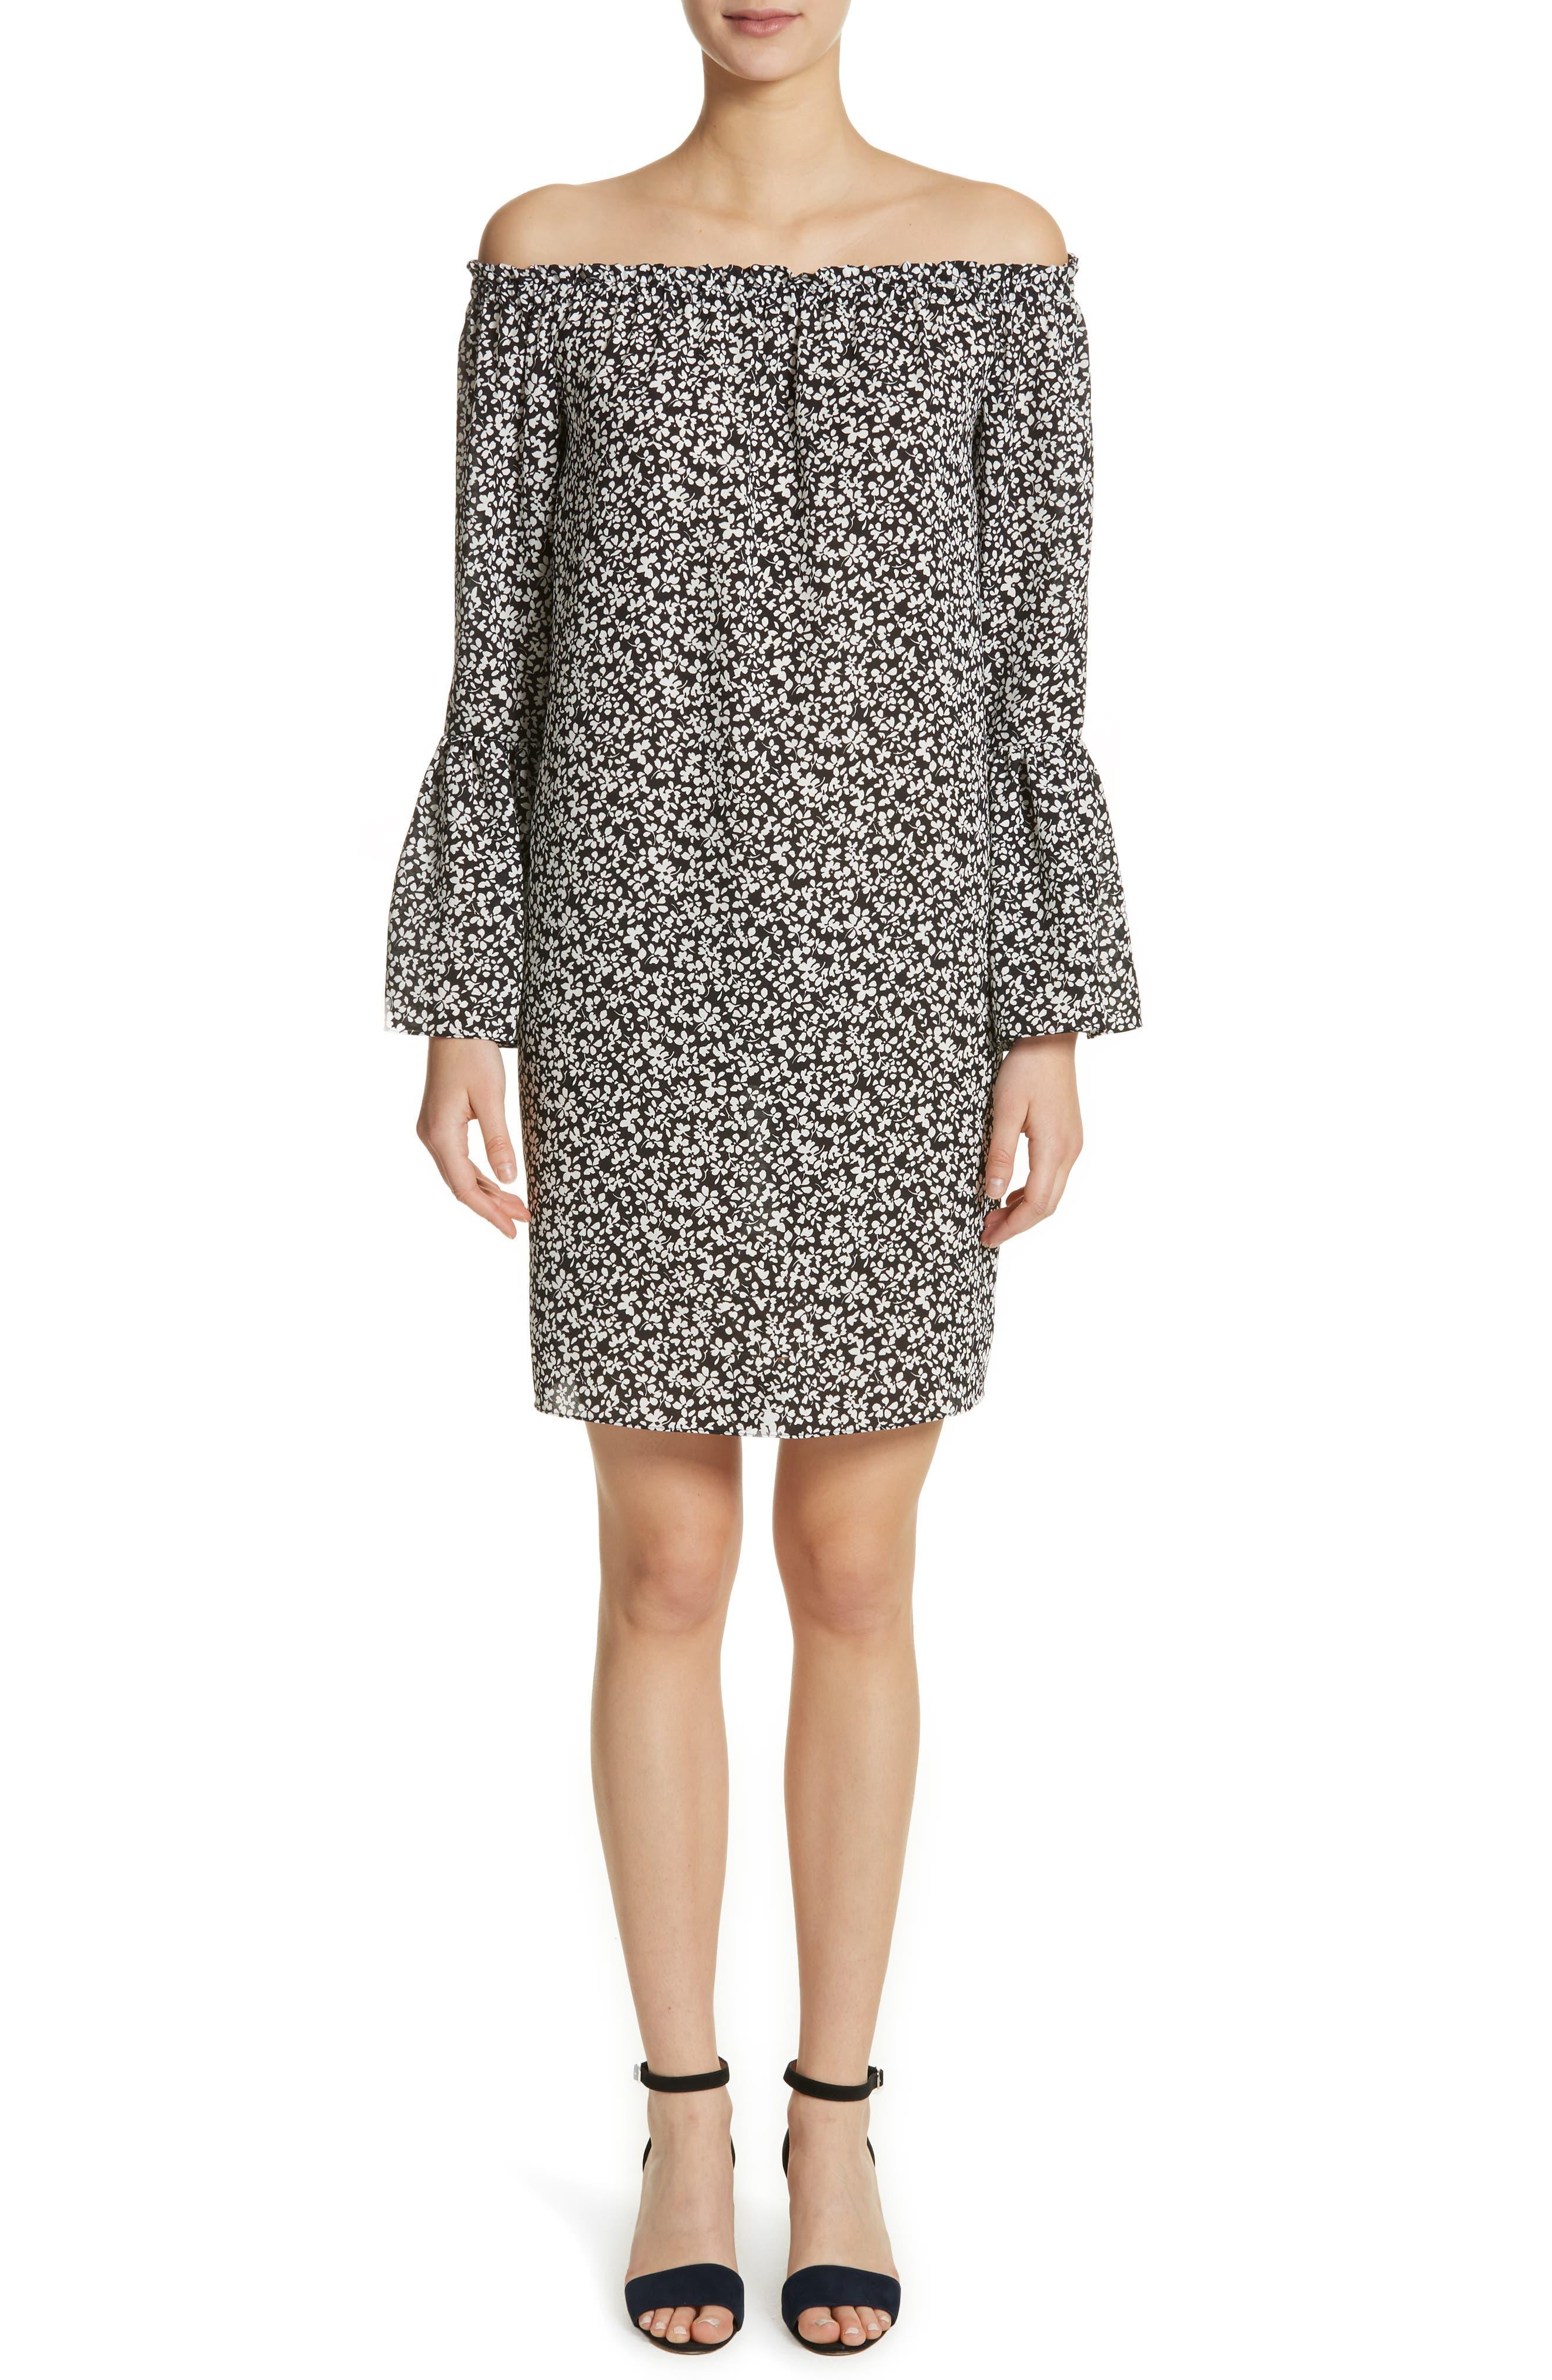 Main Image - Michael Kors Print Silk Off the Shoulder Dress